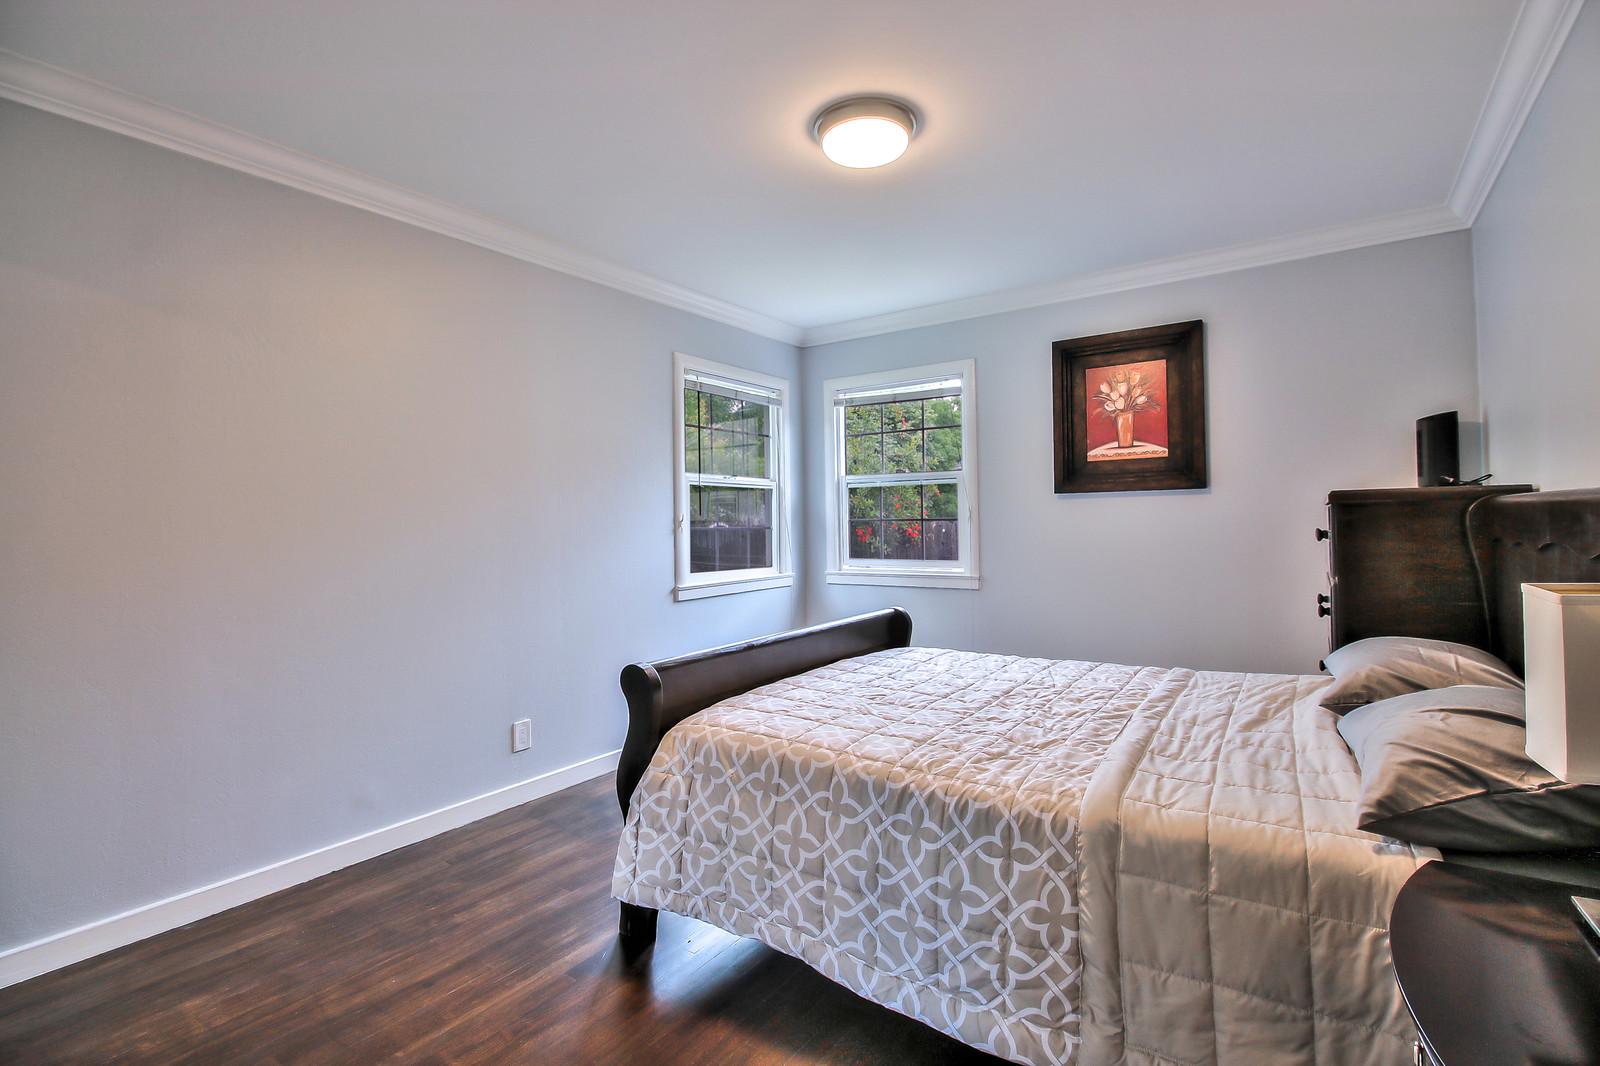 Bedroom at San Jose Duplex Apartment